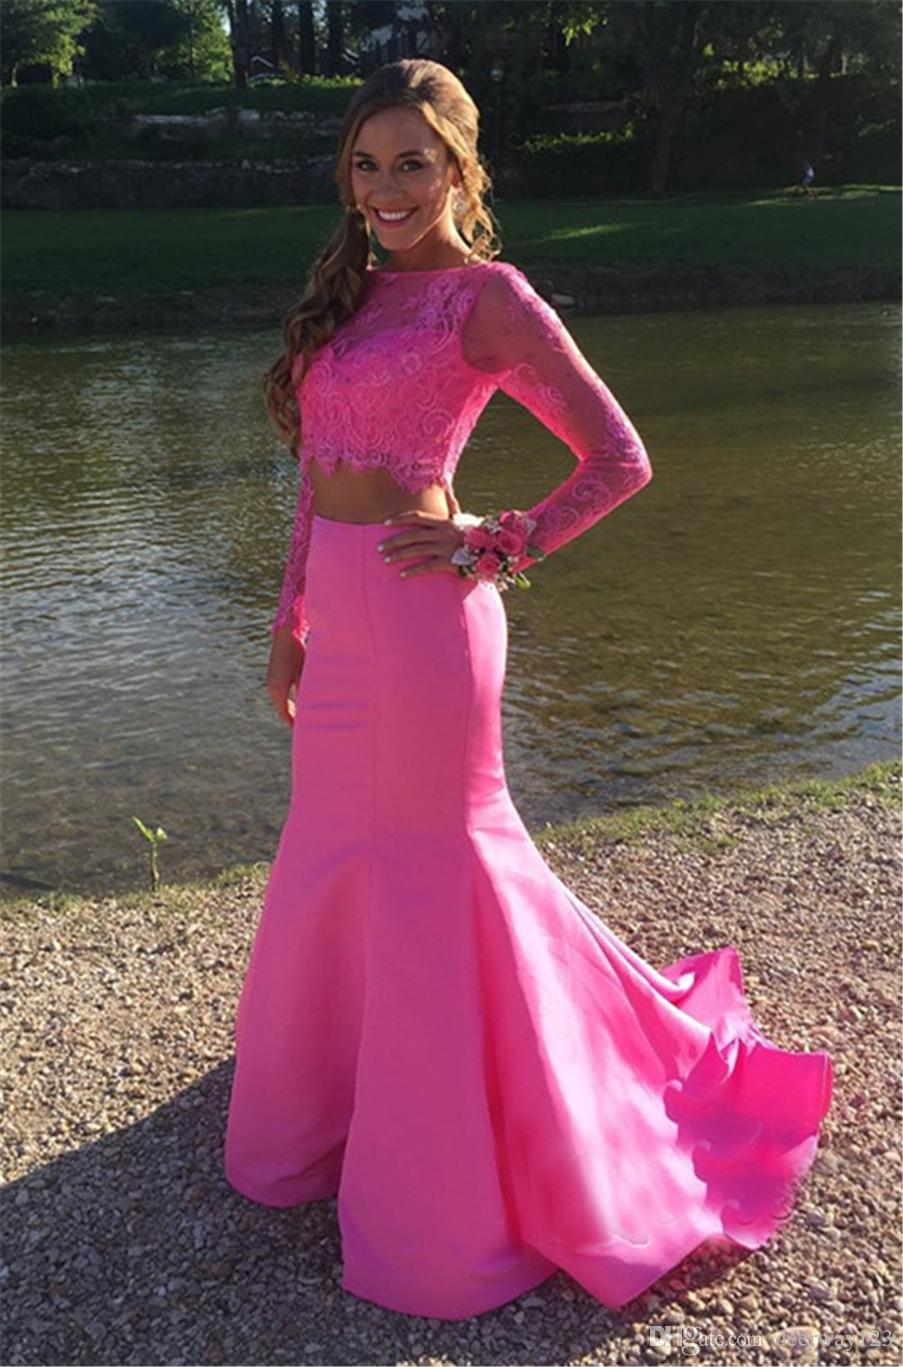 Mermaid Cute Two-Piece Long-sleeve Lace Prom Dress Jewel Neckline Pink Taffeta Evening Dress vestidos para formatura